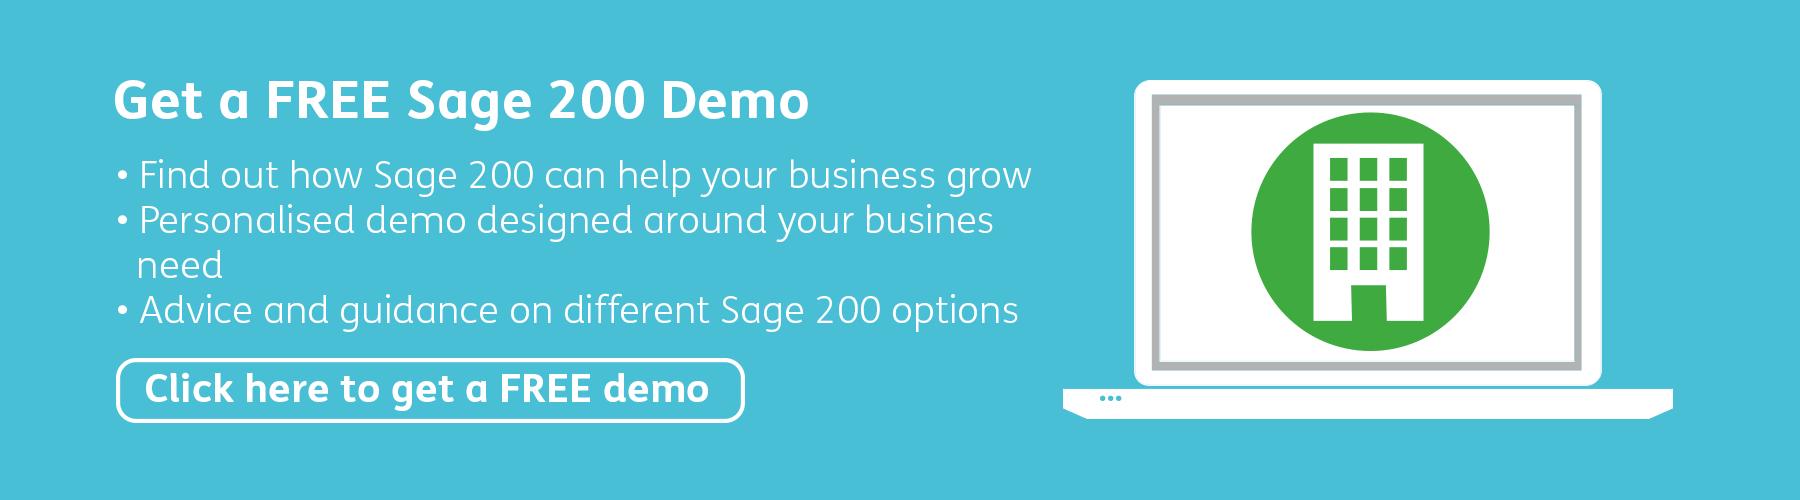 Get a free Sage 200 demo cta